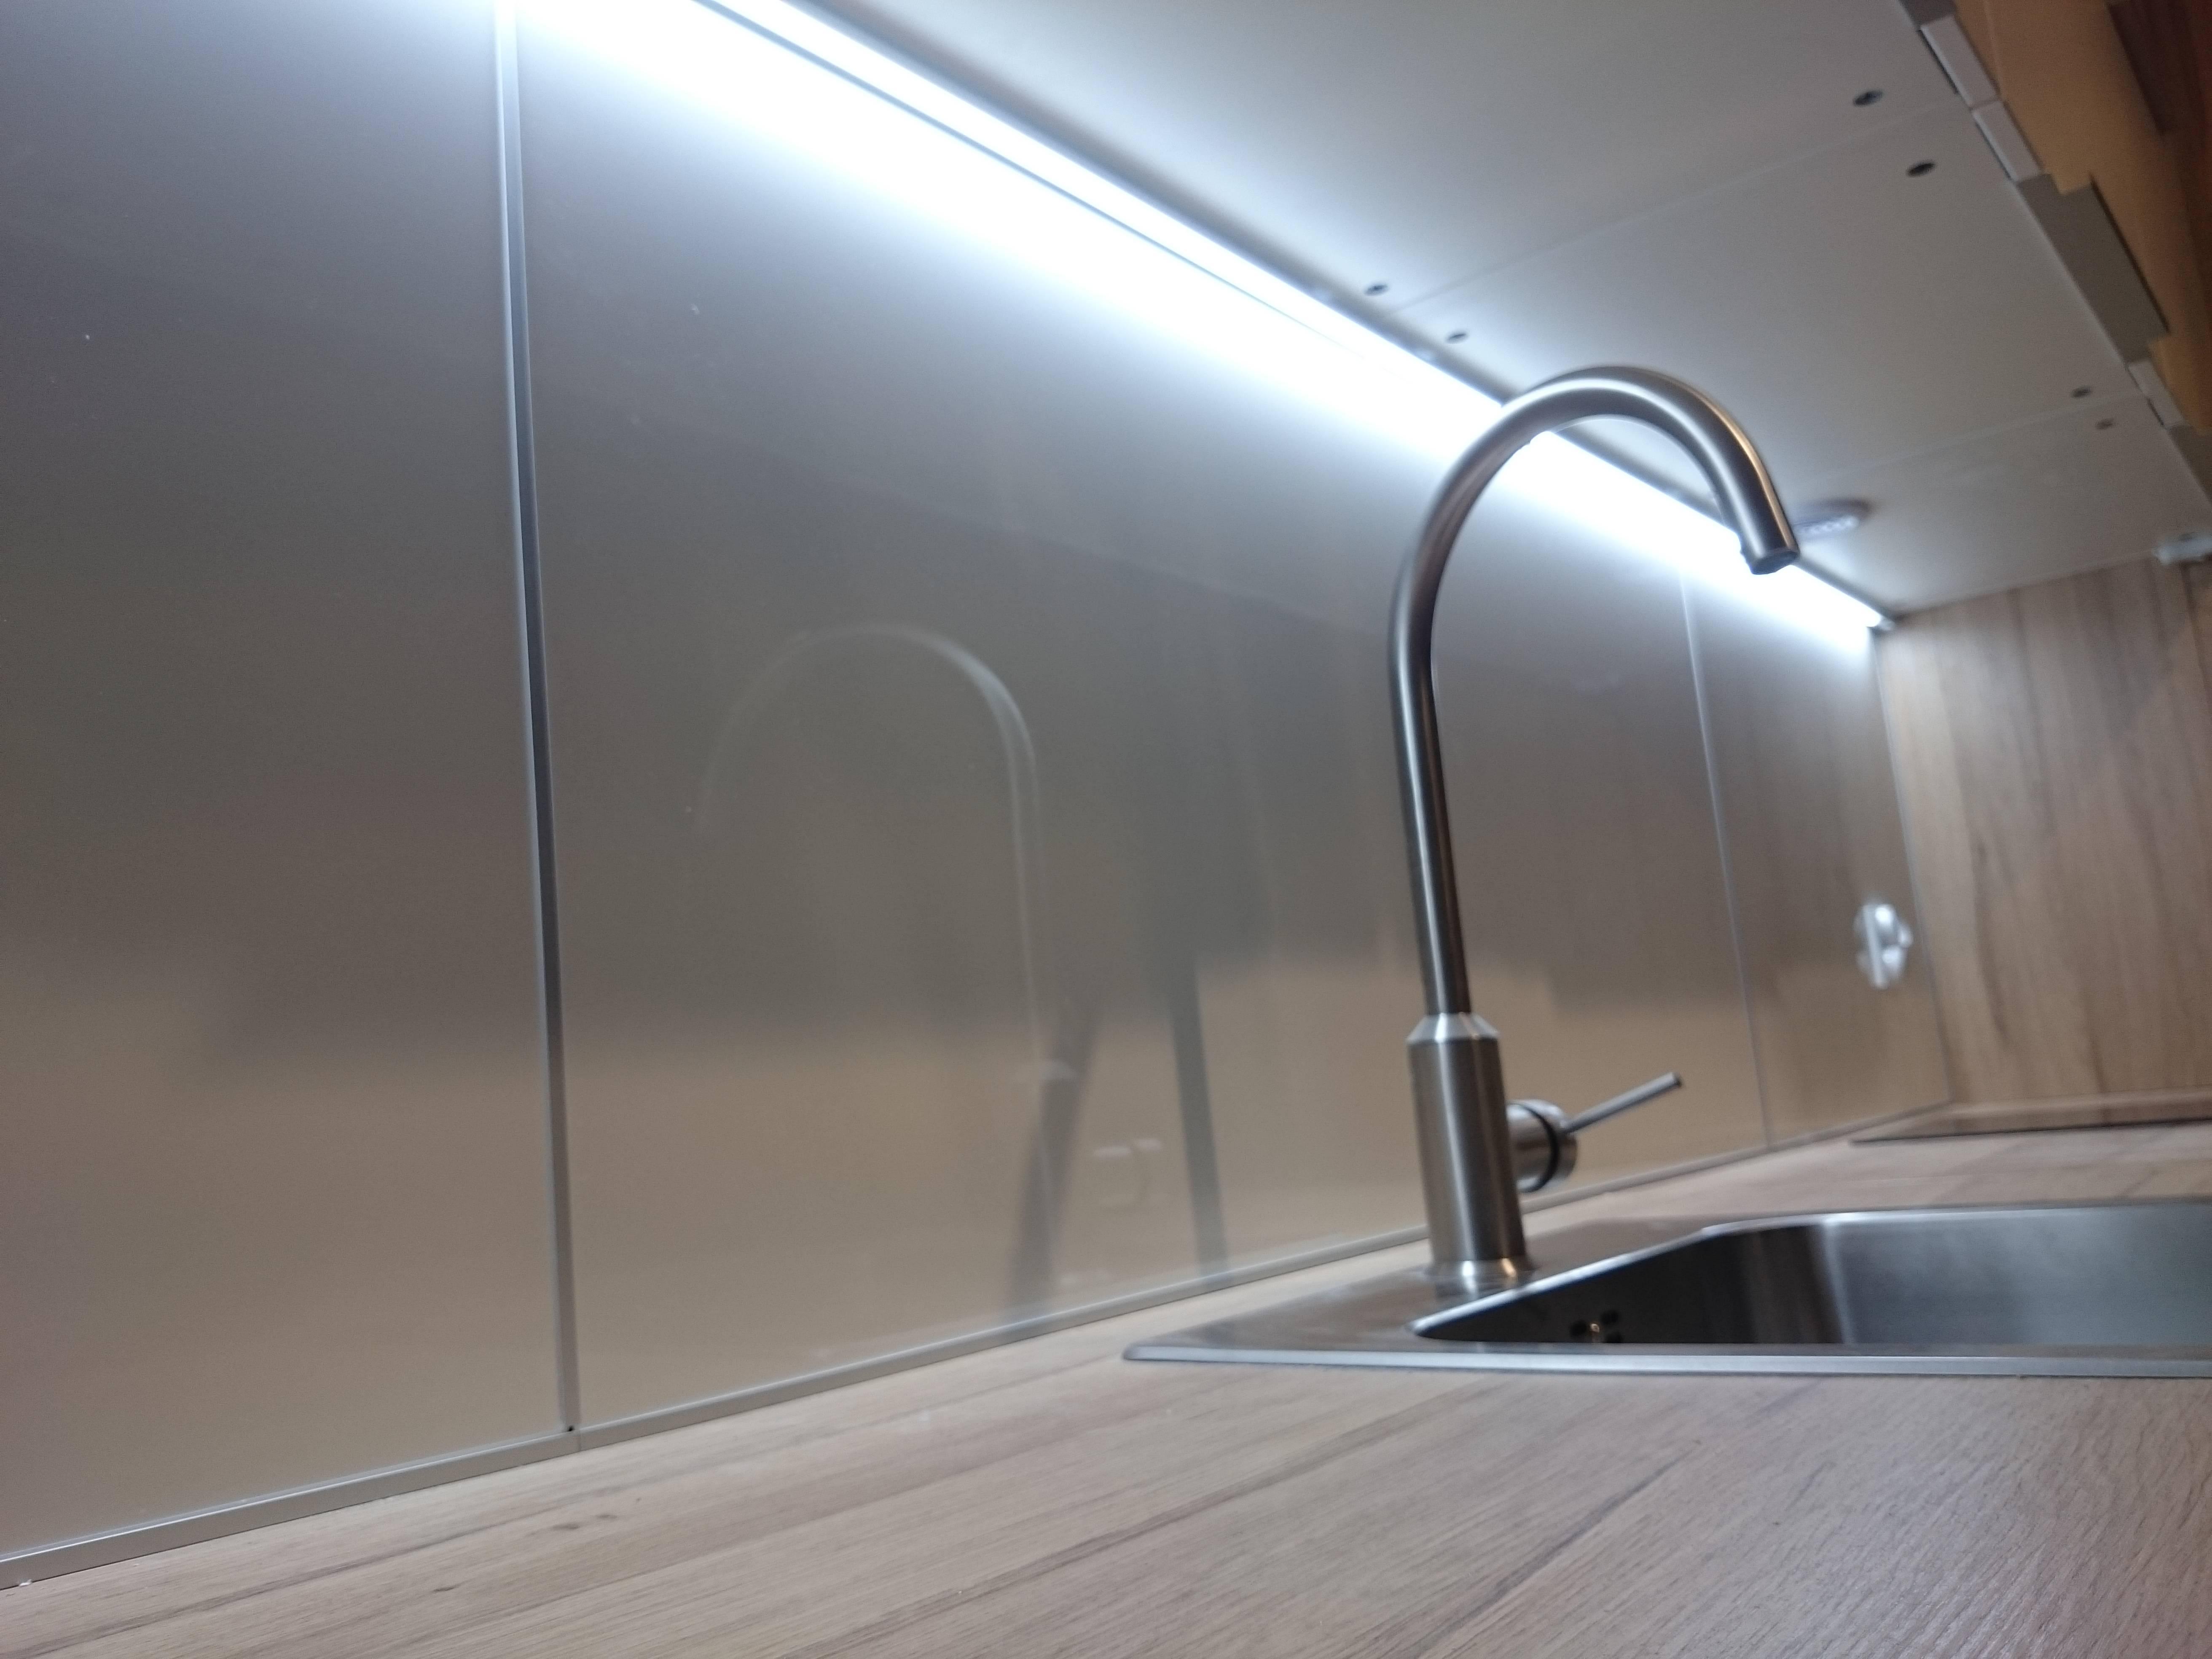 Montaż paneli ochronnych LYSEKIL Ikea